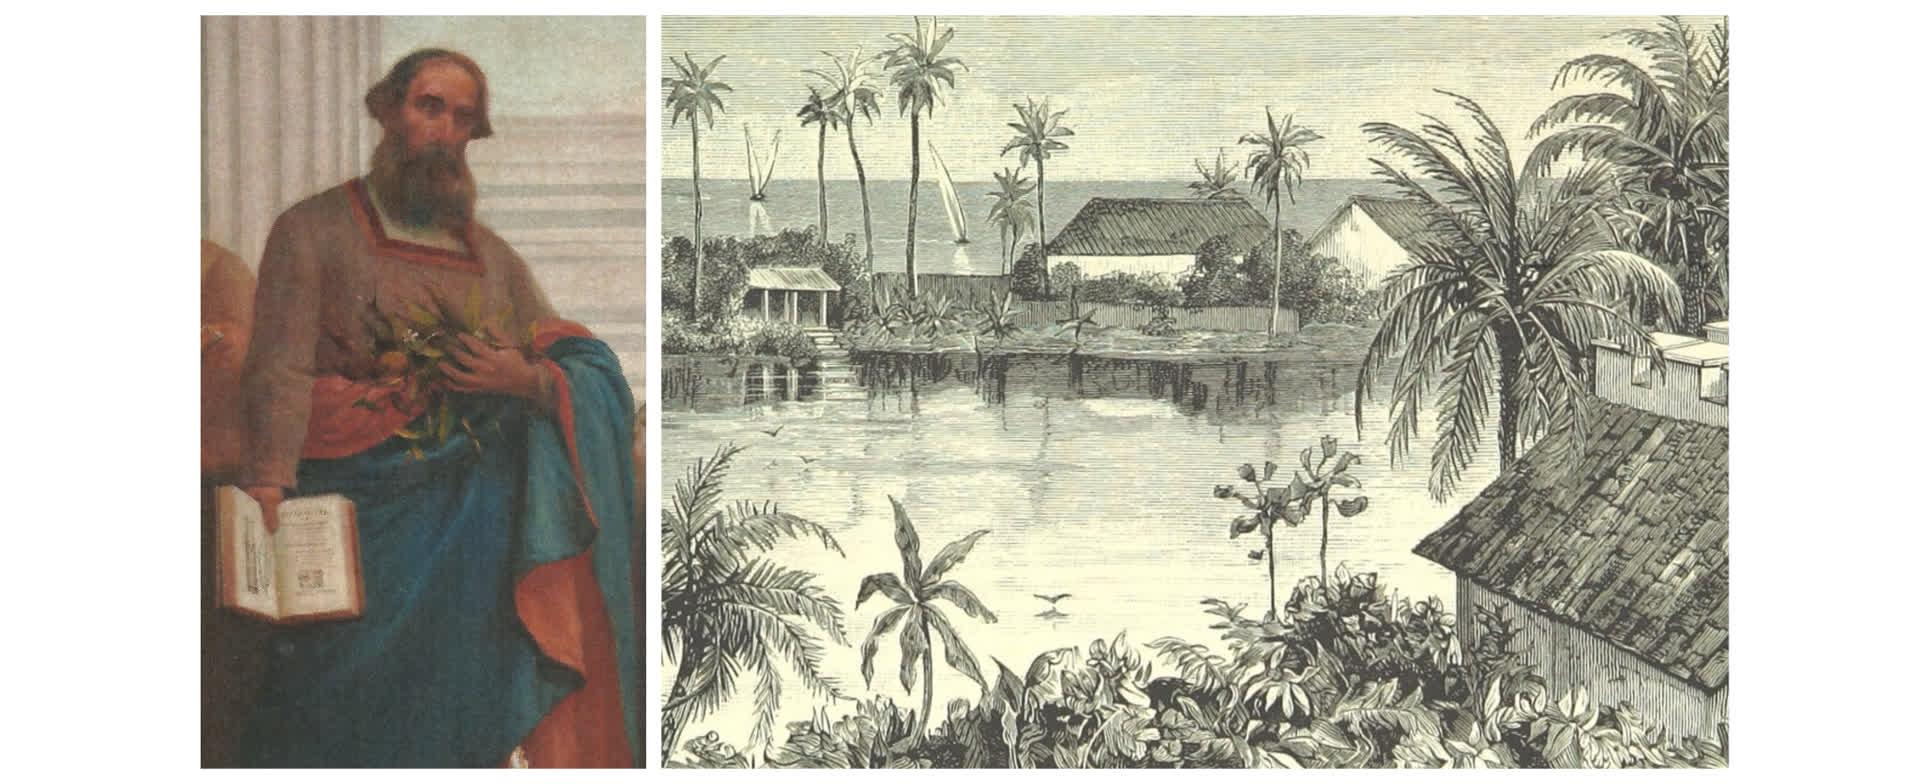 Garcia da Orta: Mumbai's First European Resident